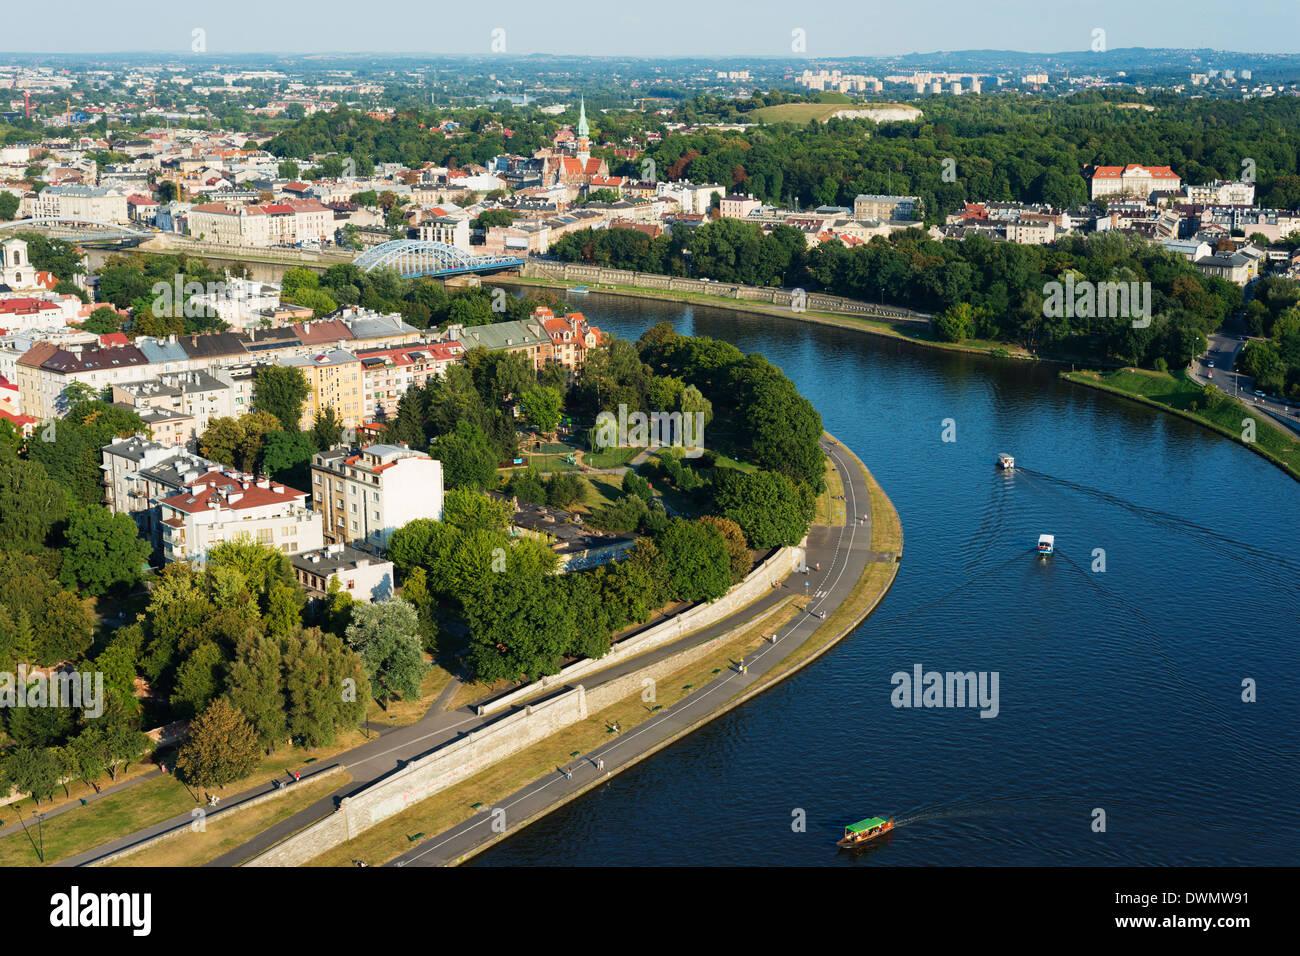 Vistula River, Krakow, Malopolska, Poland, Europe - Stock Image